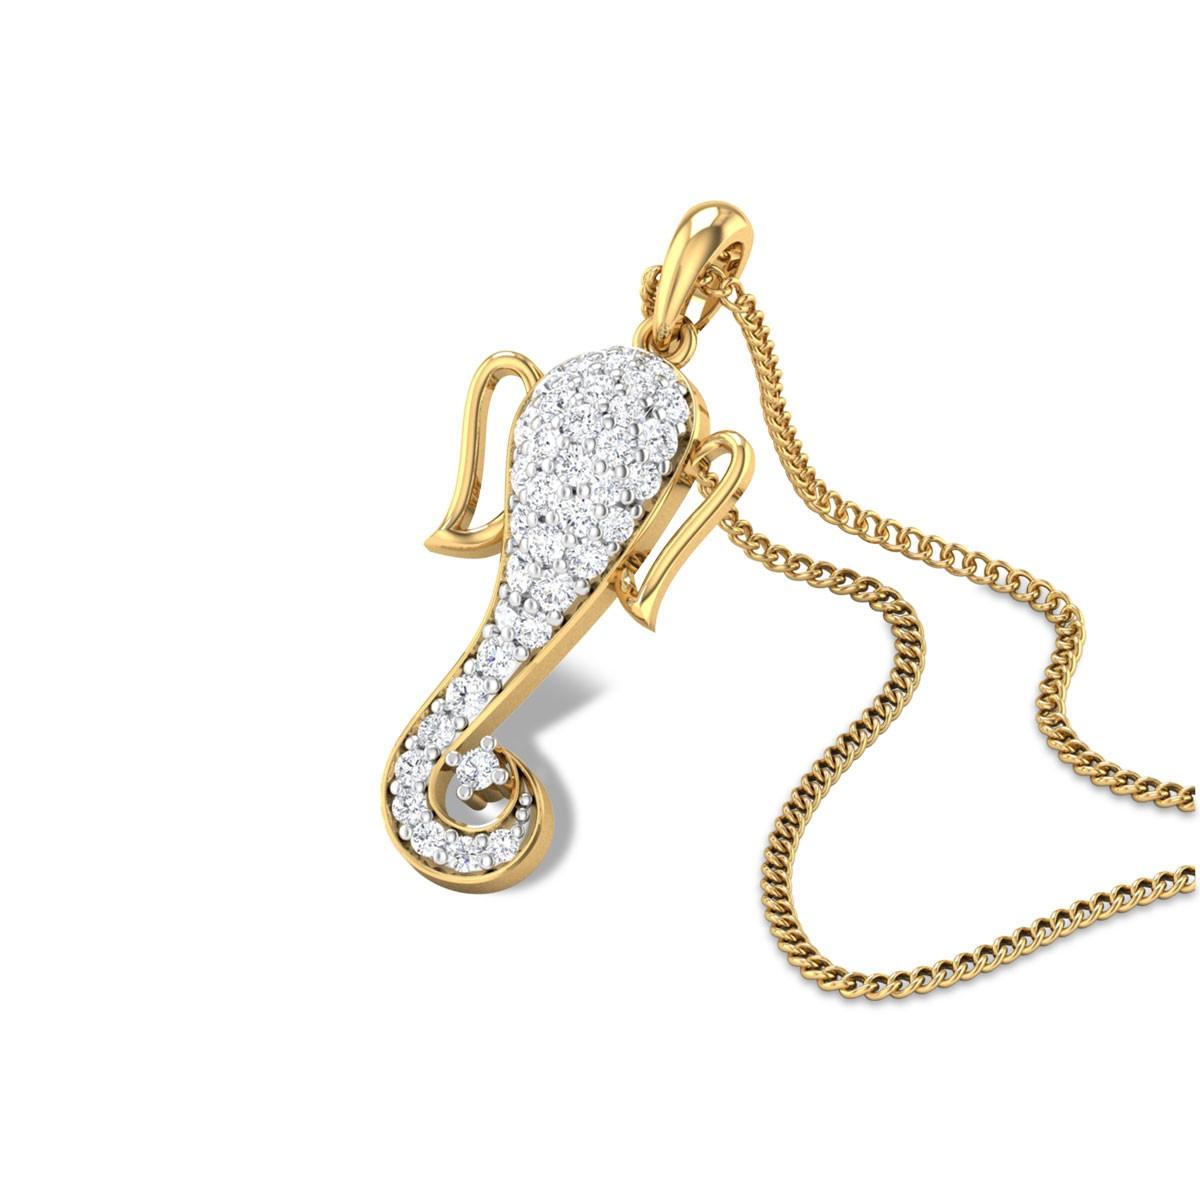 Gajavakra Diamond Pendant